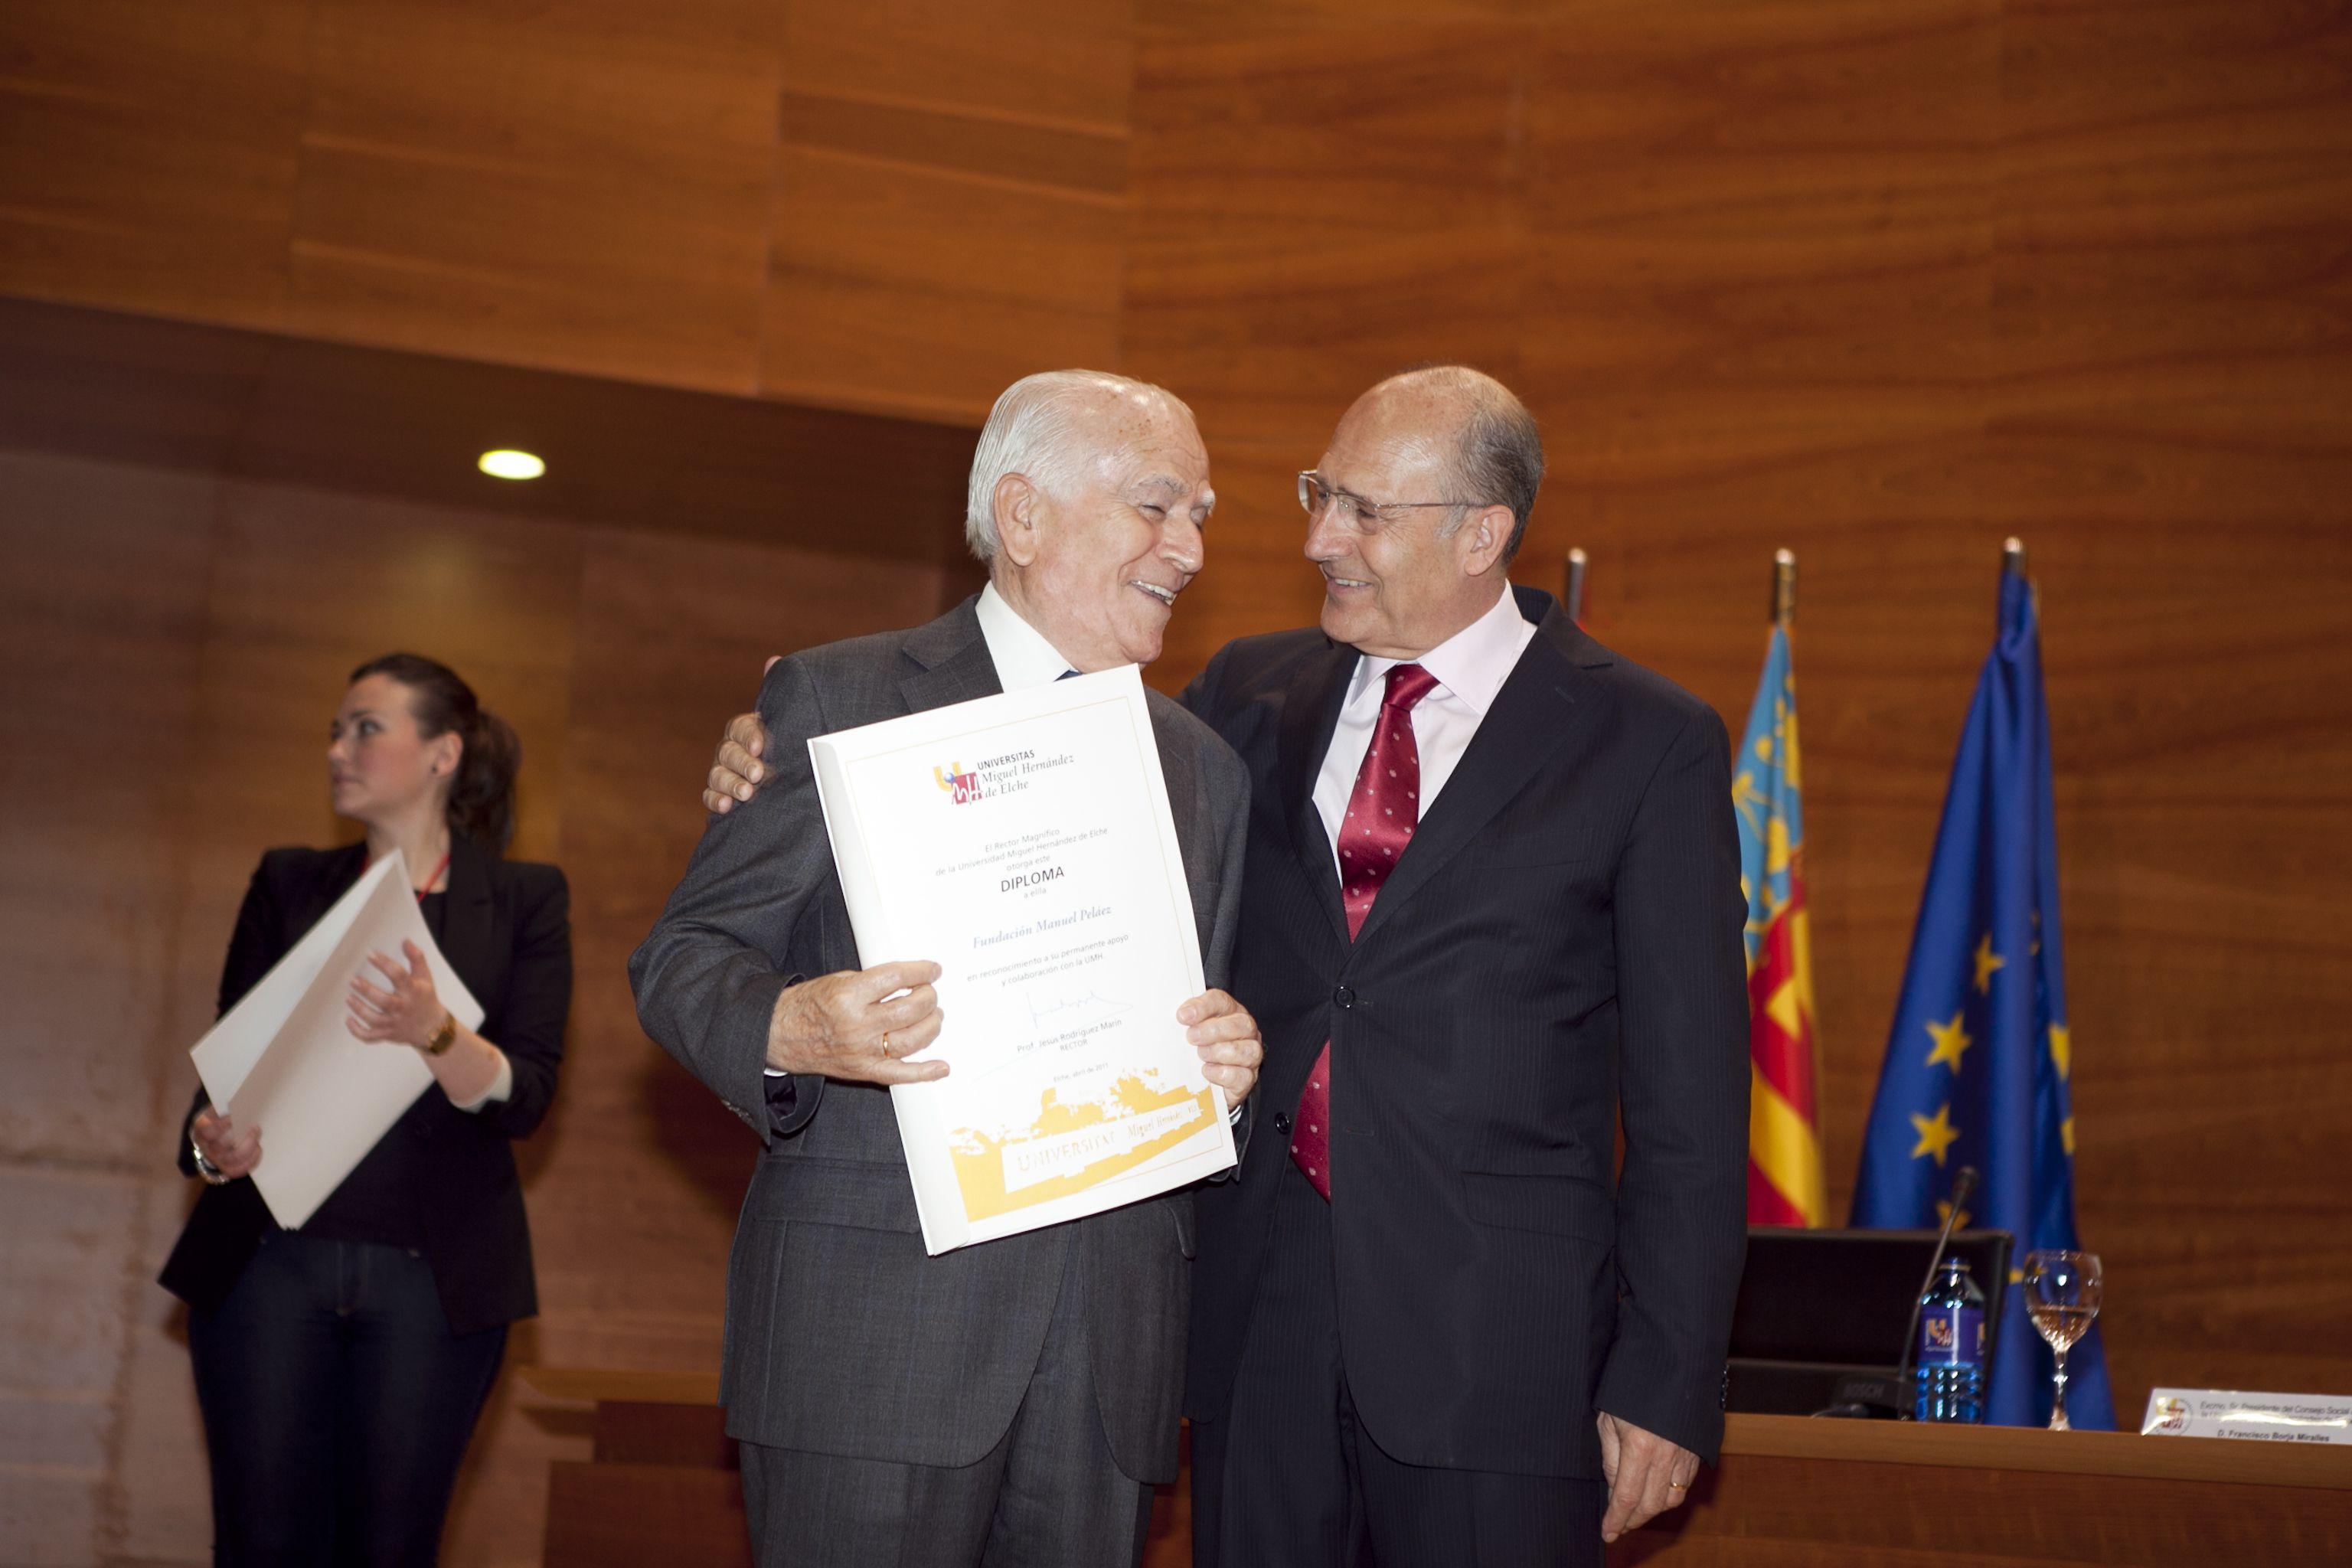 umh-diplomas-rector_mg_6673.jpg